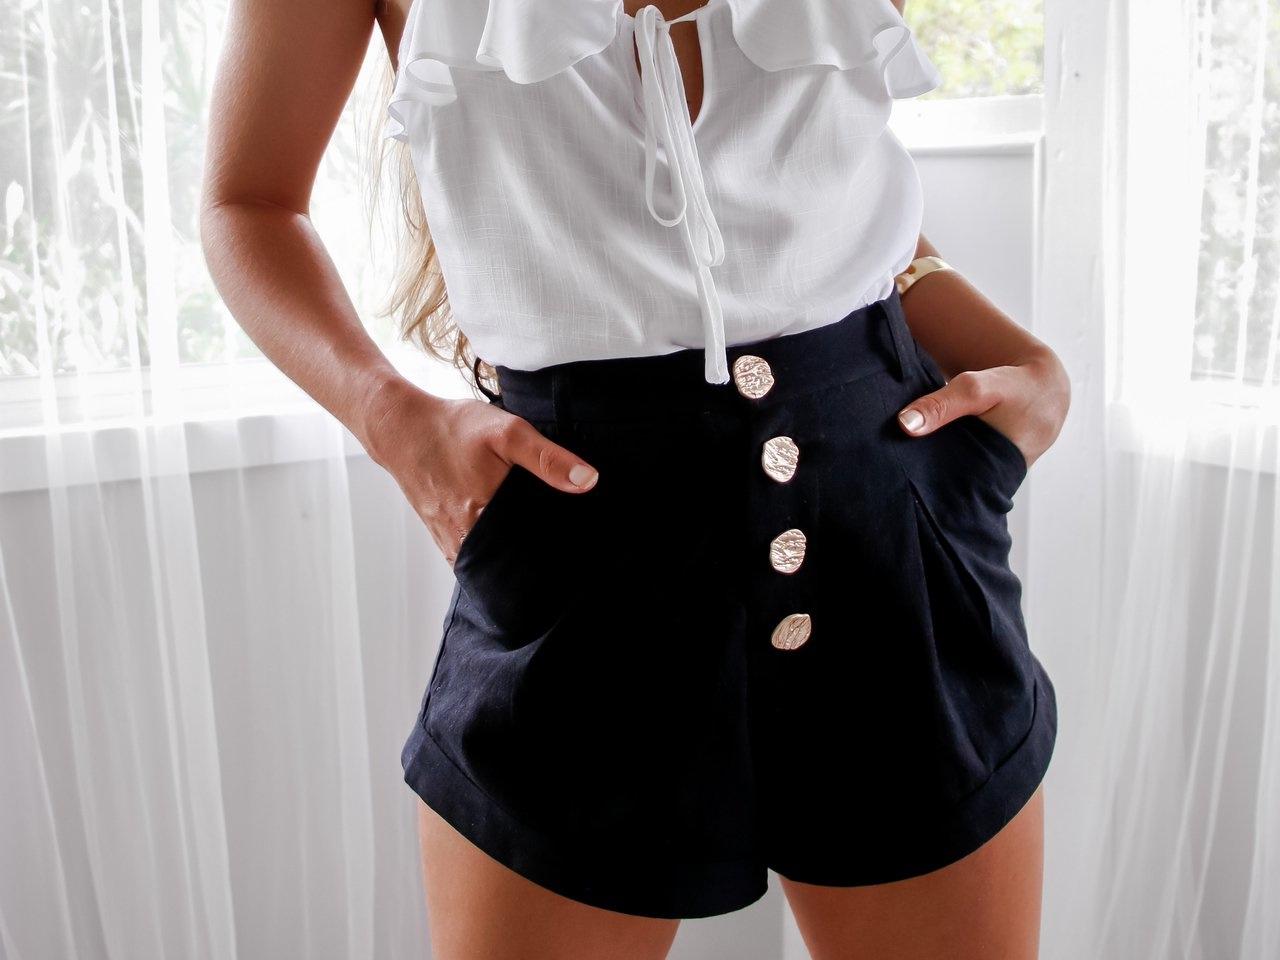 ollie_cami_white_capri_shorts_black_12_of_15_1__69318_2000x.jpg